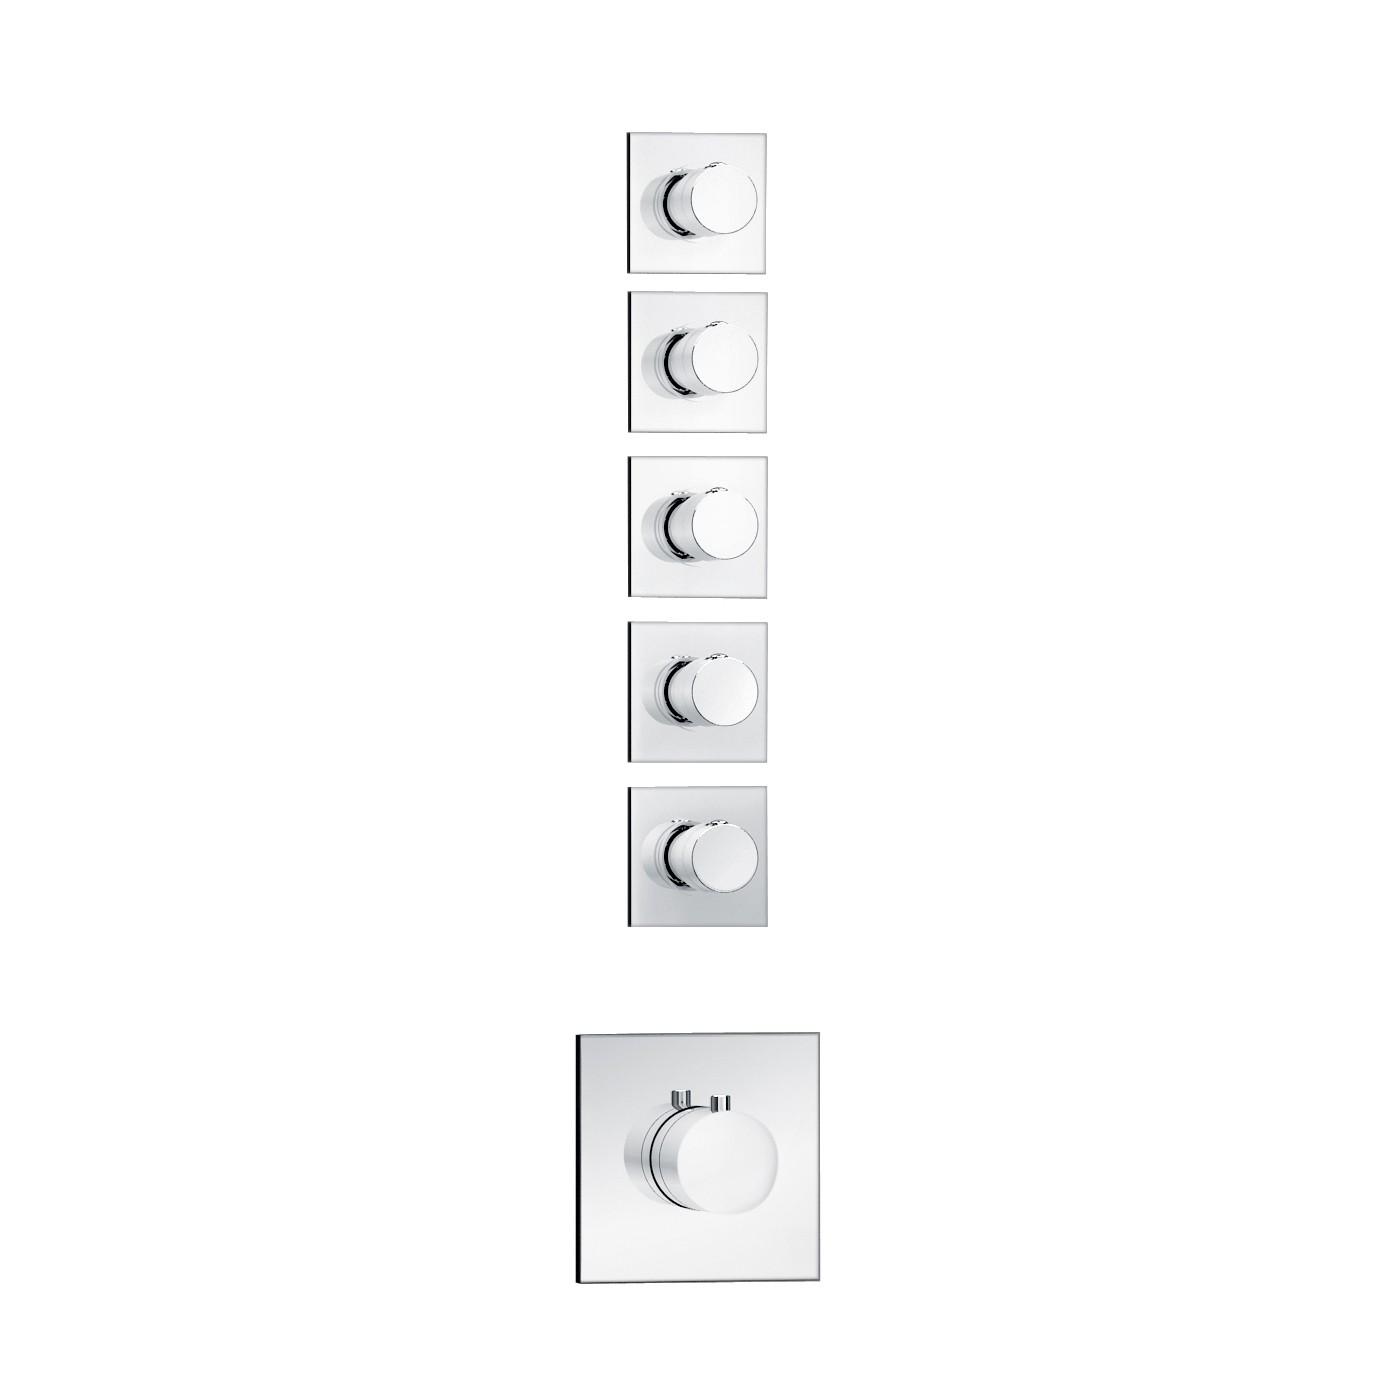 Soho 5 Wege Unterputz Thermostat Armatur Armaturen Dusche (Unterputz) | {Armaturen dusche unterputz 14}